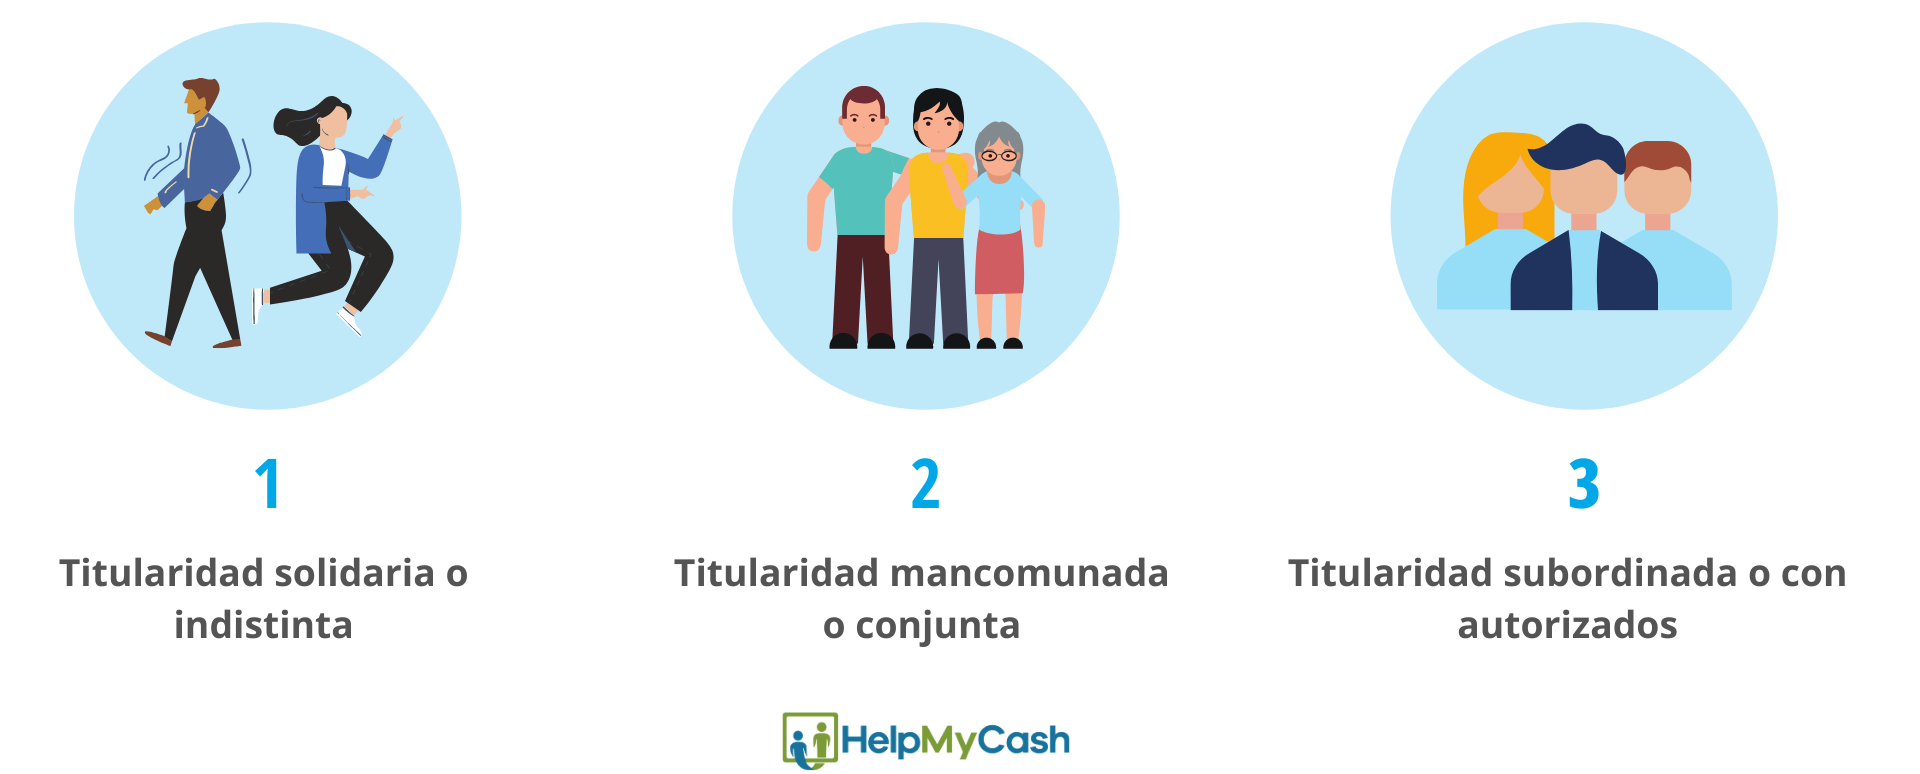 Titulares cuenta bancaria: 1- titularidad solidaria cuentas bancarias.2-  titularidad mancomunada. 3- titularidad subordinada o autorizada